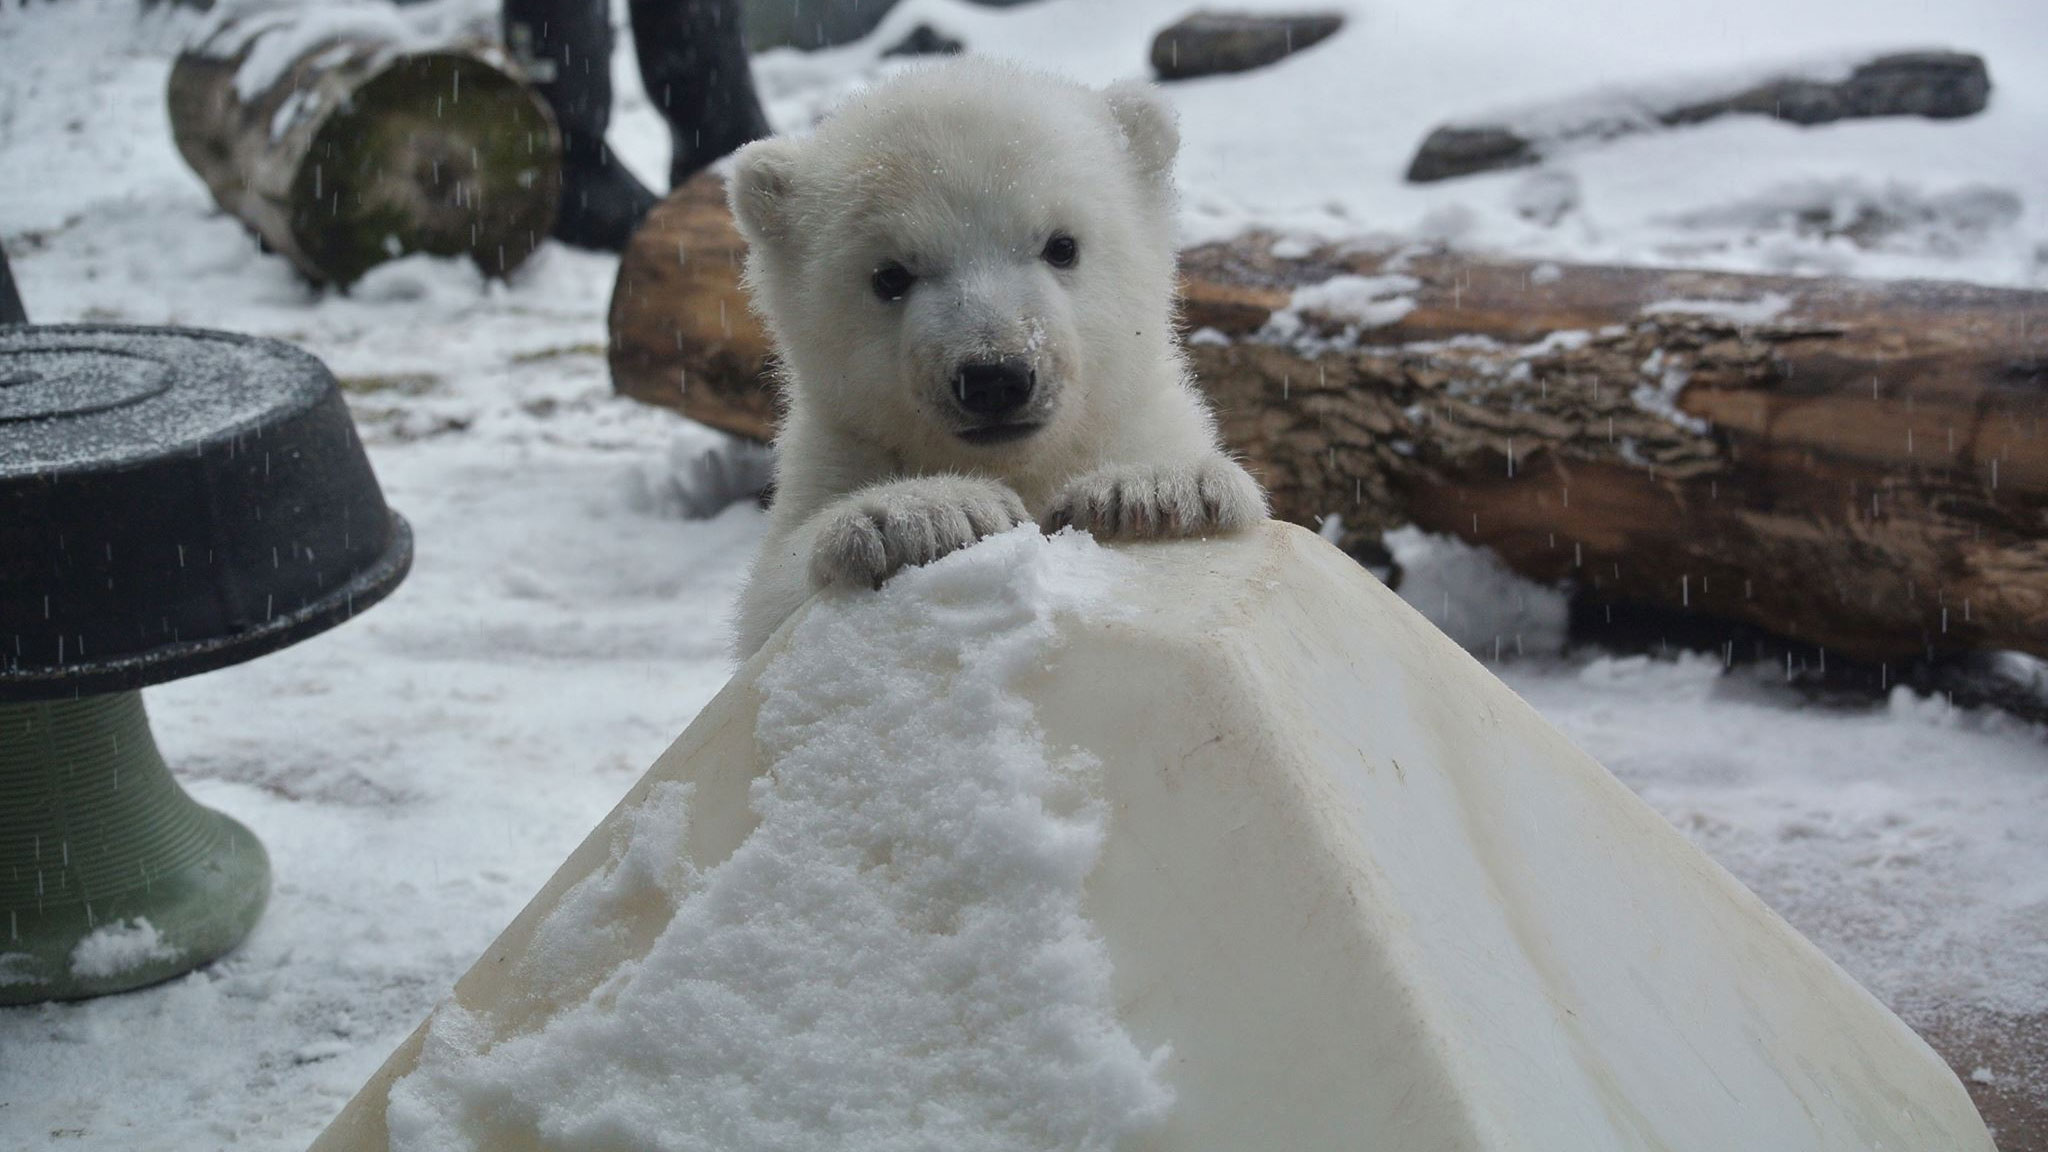 Toronto Zoo's polar bear cub at three months old on Feb. 12, 2016. TORONTO ZOO.